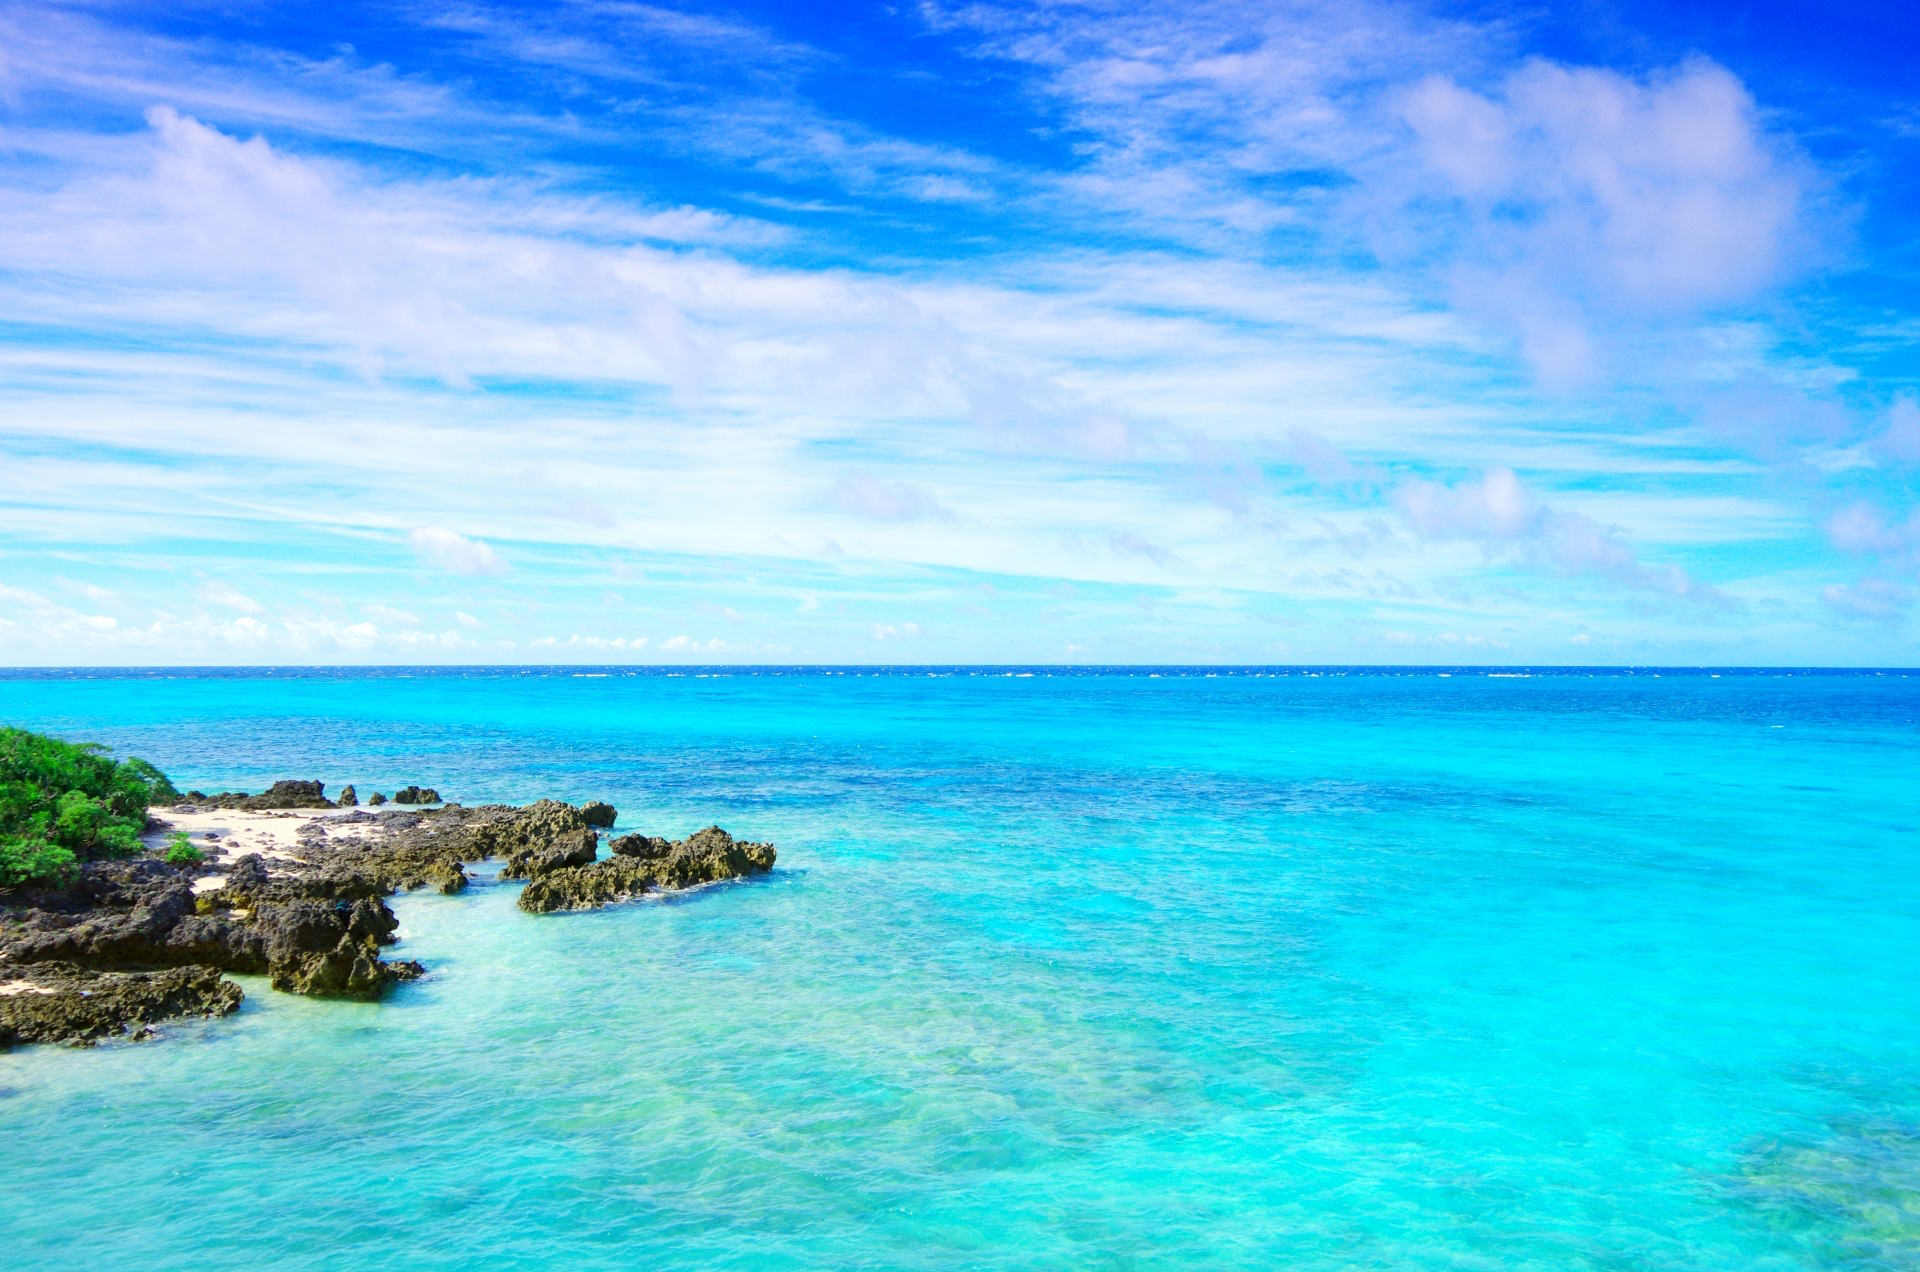 Turquoise blue ocean in Okinawa